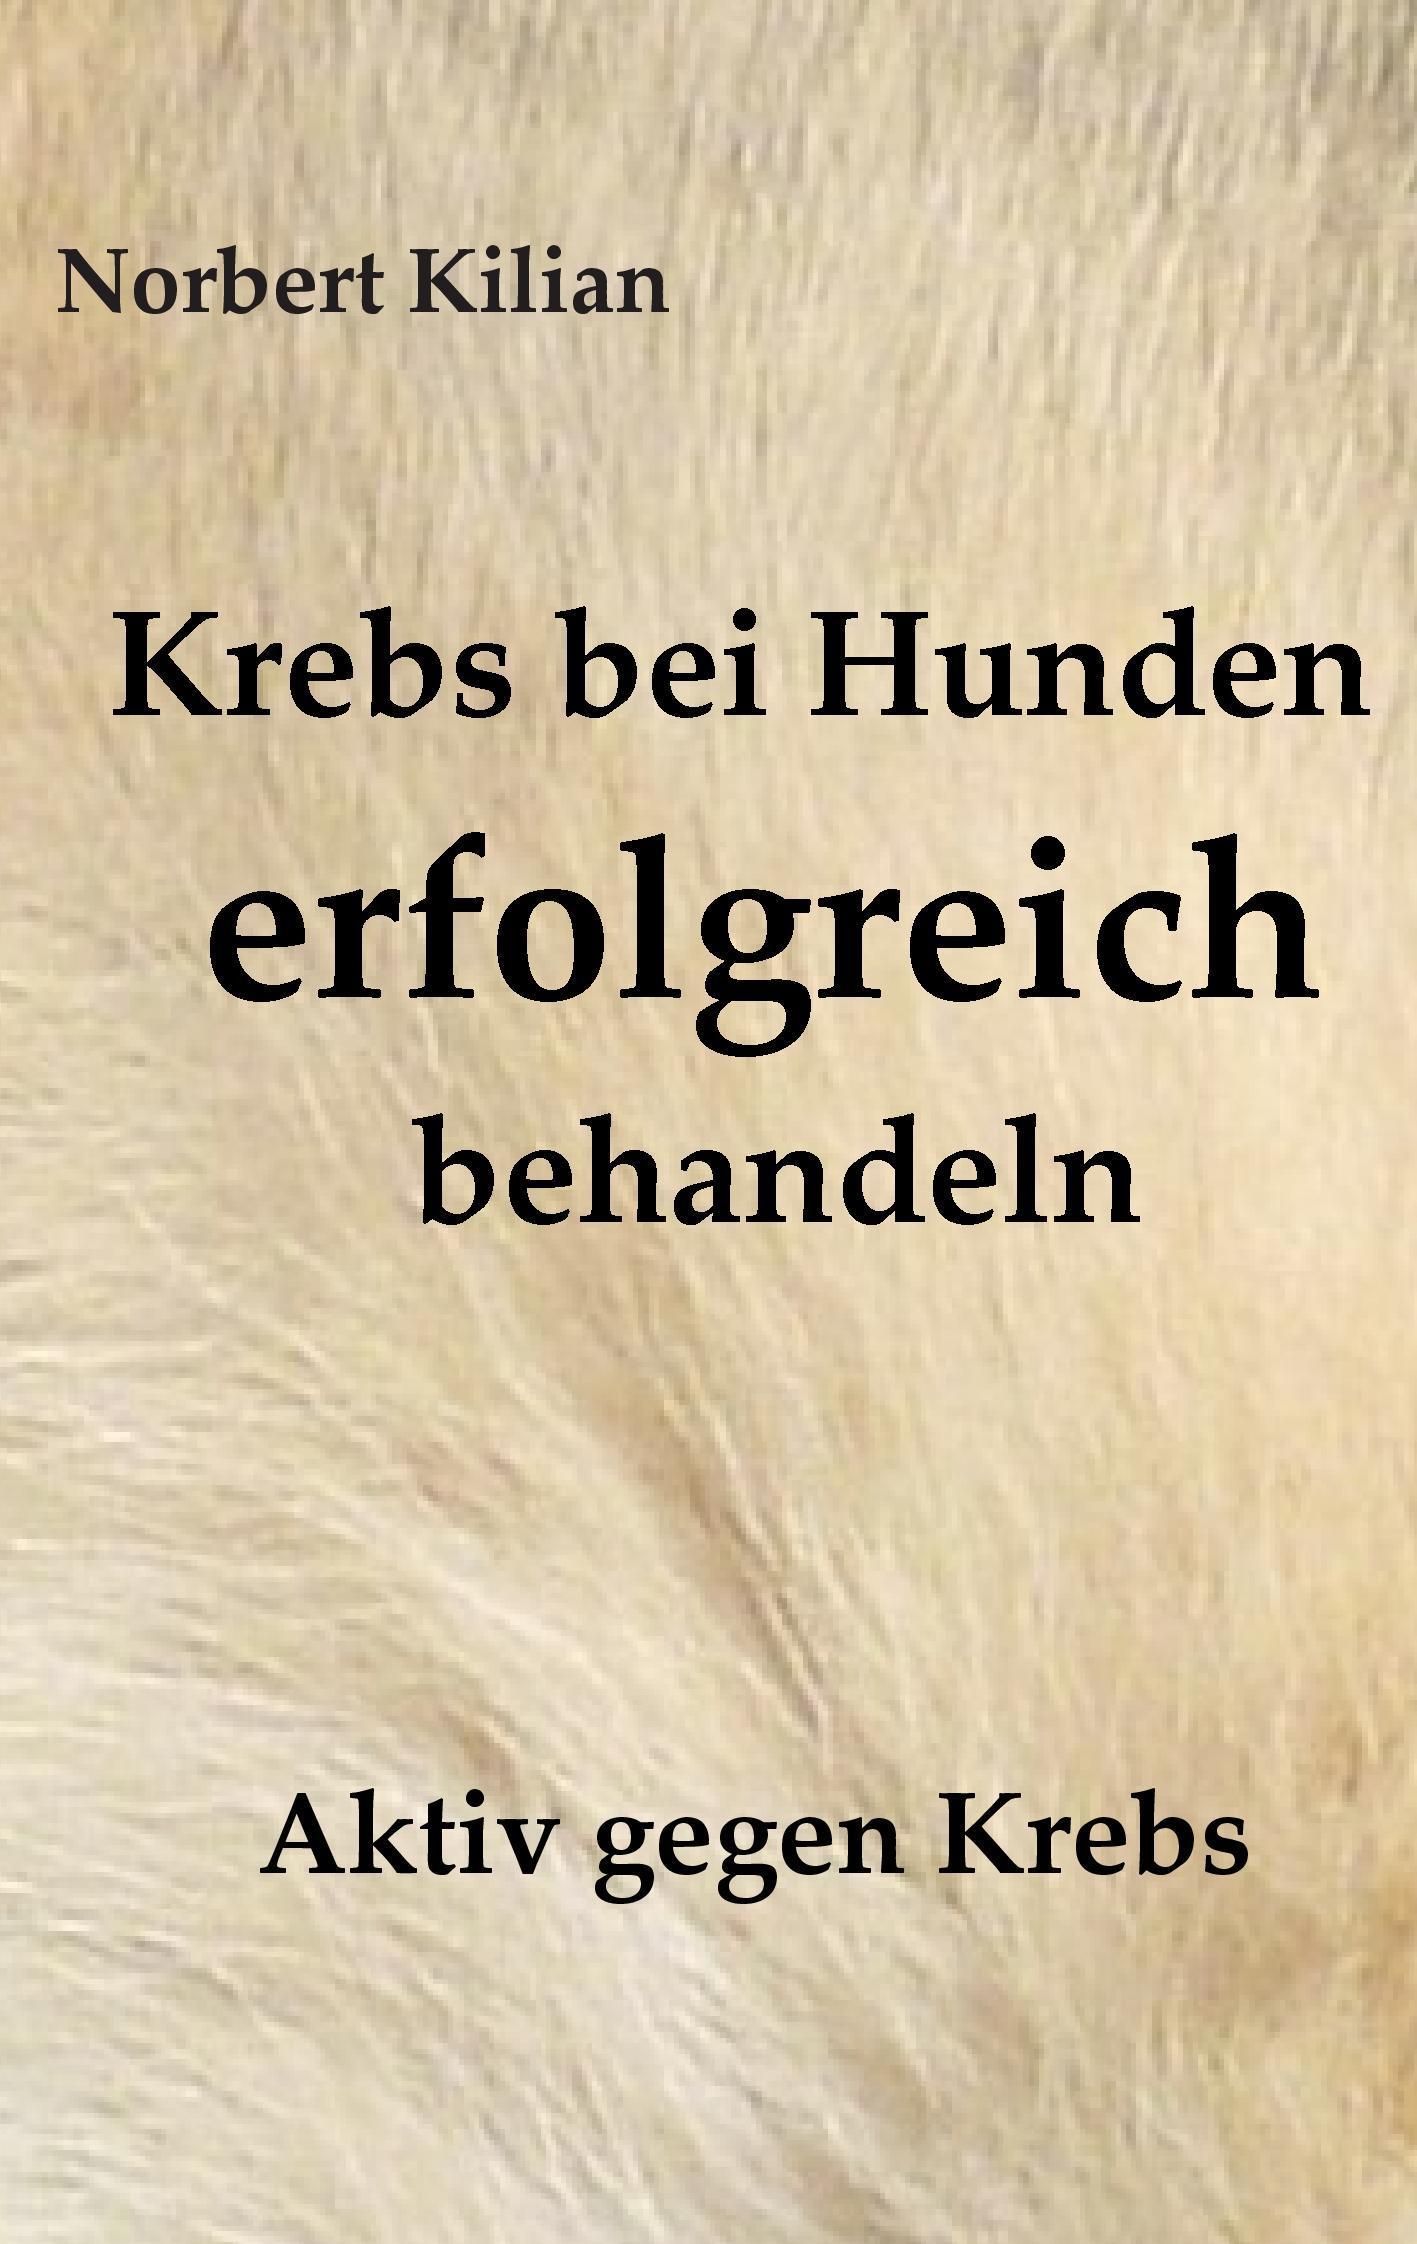 Kilian, N: Krebs bei Hunden erfolgreich behandeln